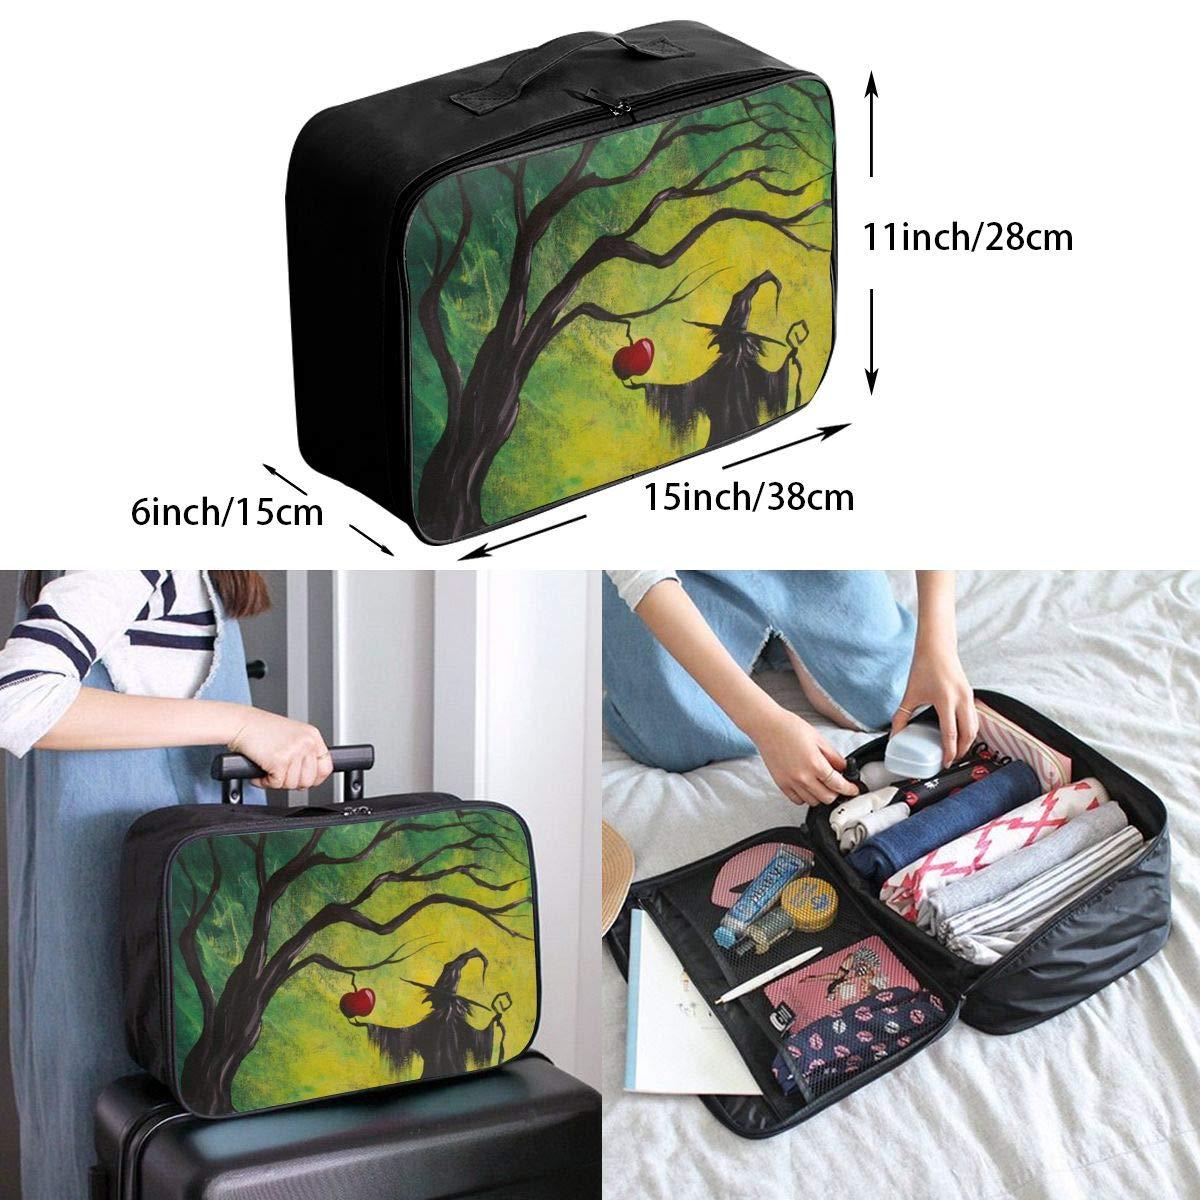 Travel Luggage Duffle Bag Lightweight Portable Handbag Wizard Print Large Capacity Waterproof Foldable Storage Tote